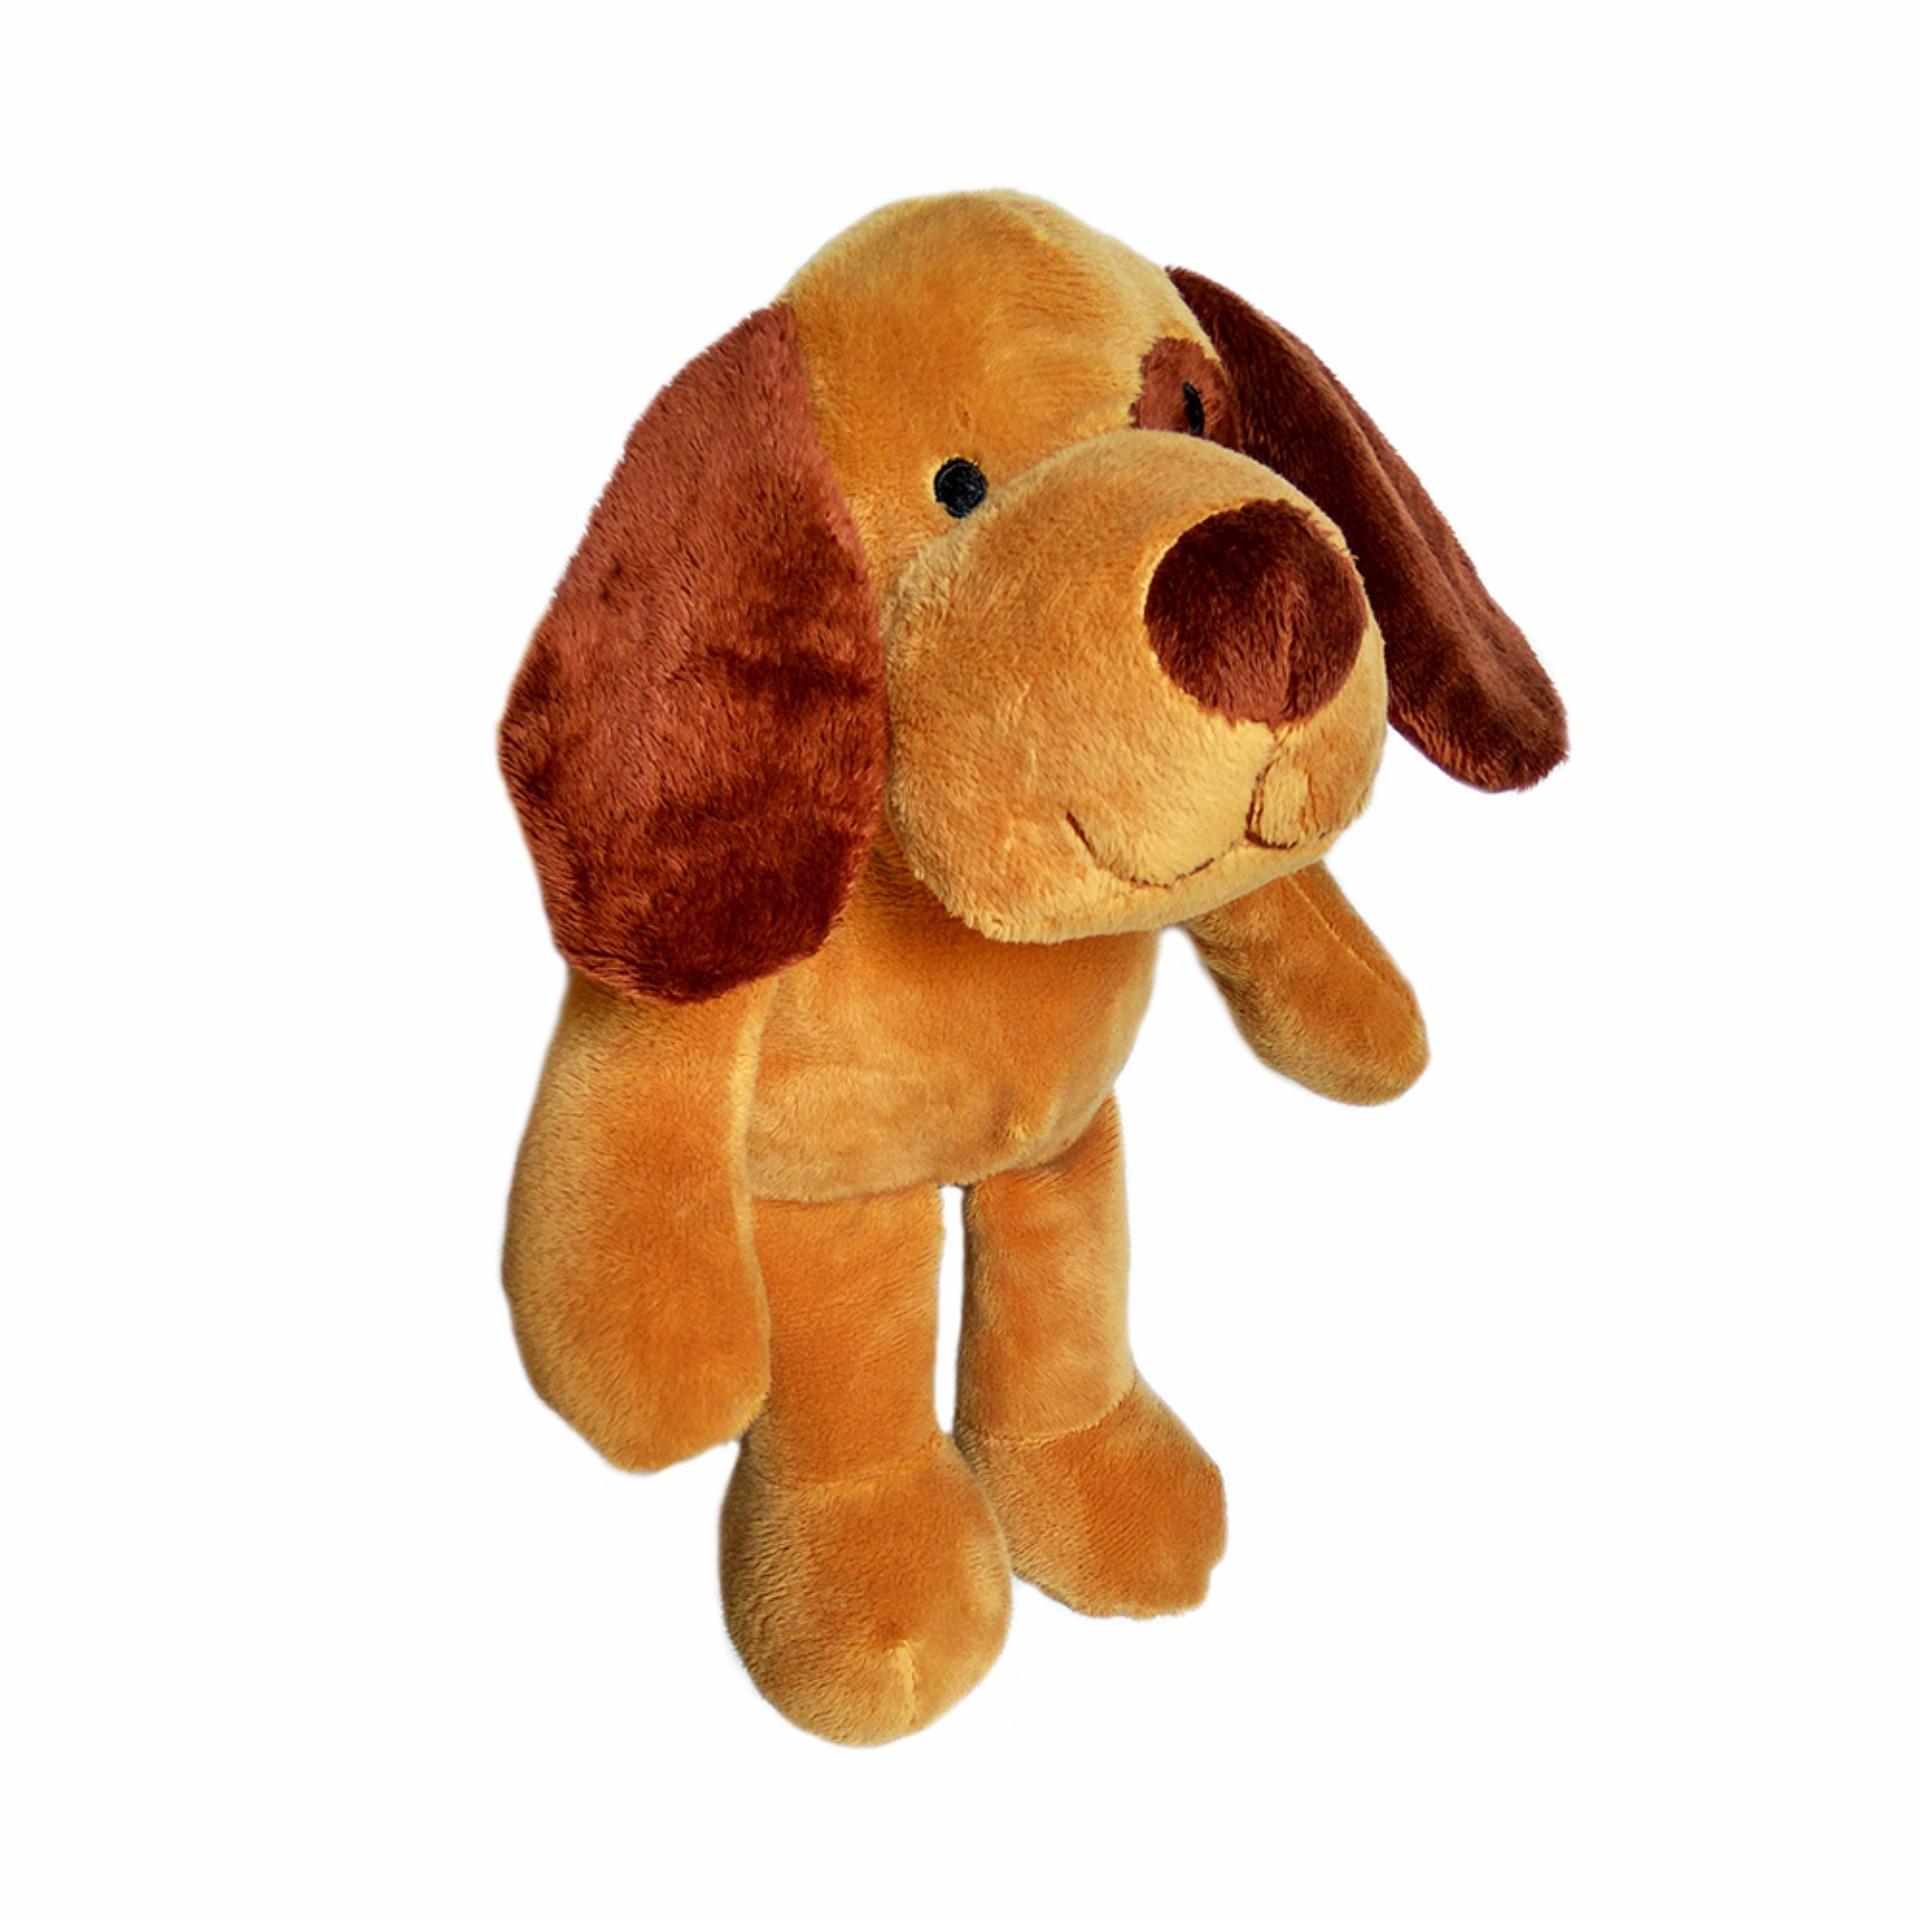 Toylogy Koleksi Boneka Hewan Kelinci Anjing Kuda Nil ( Rabbit Stuffed Plush Animal Doll For Baby ...